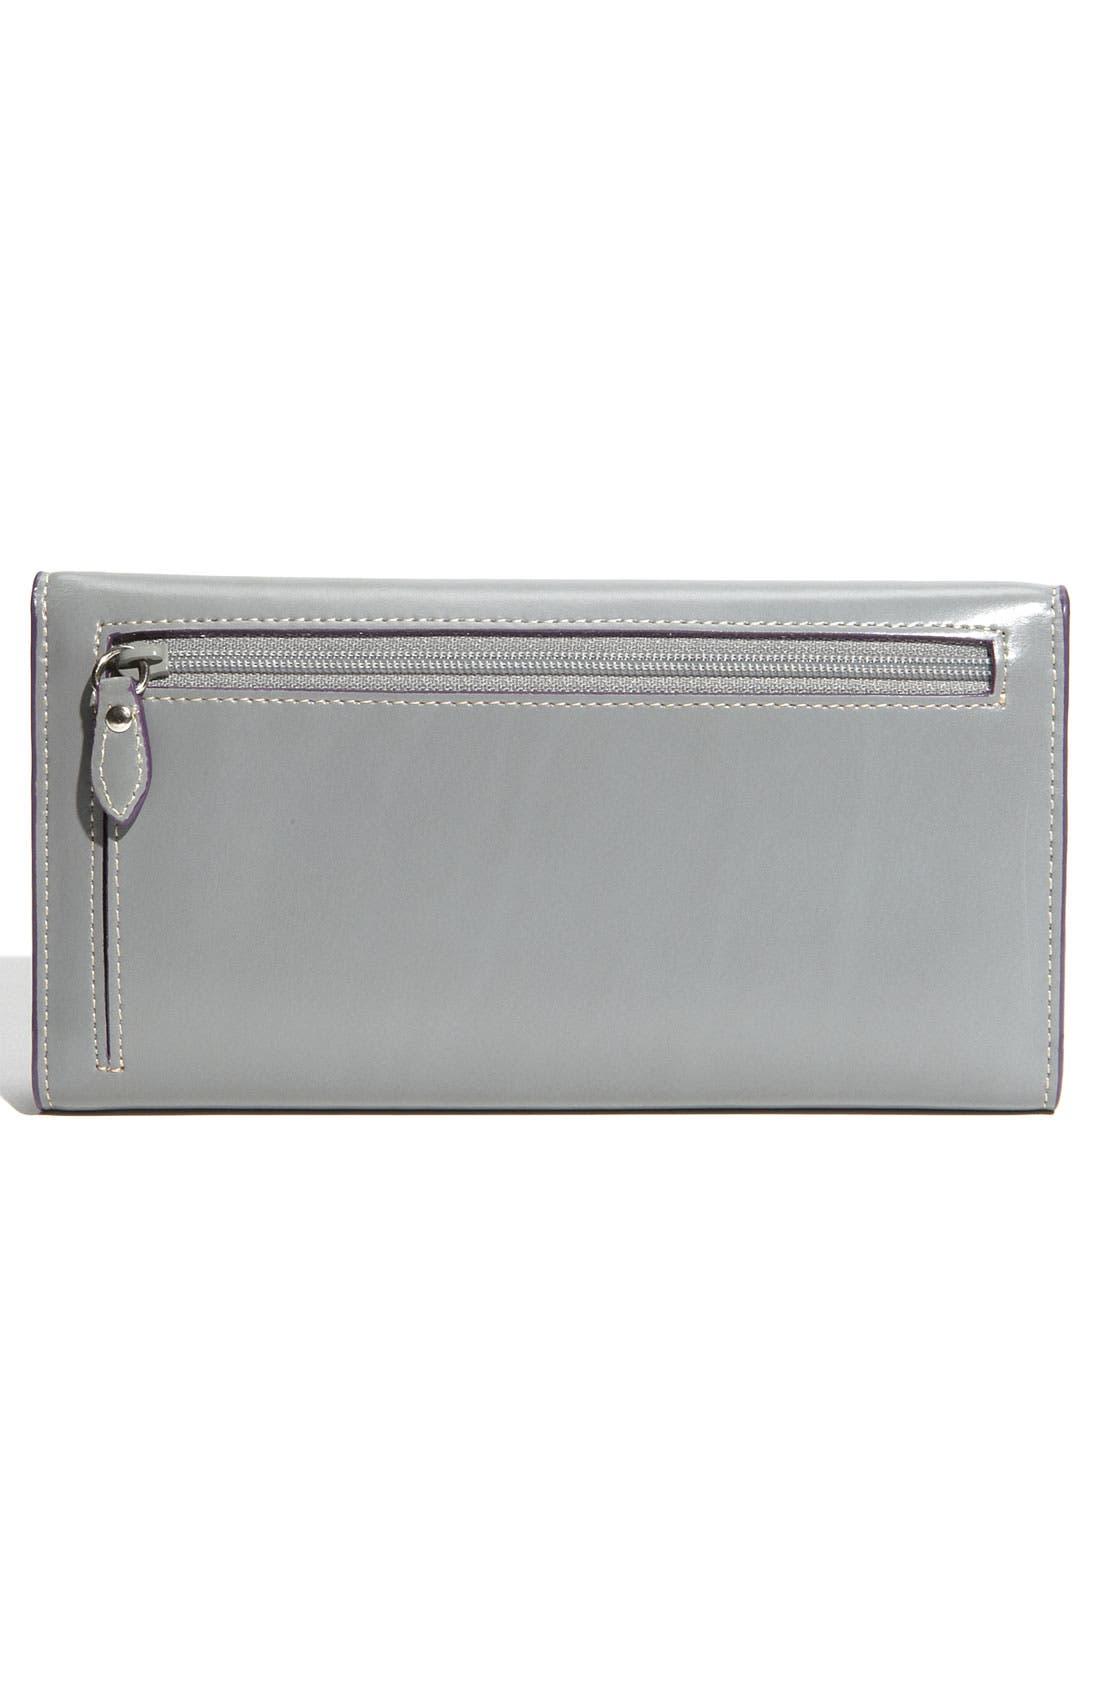 Lodis 'Audrey' Checkbook Clutch Wallet,                             Alternate thumbnail 4, color,                             035